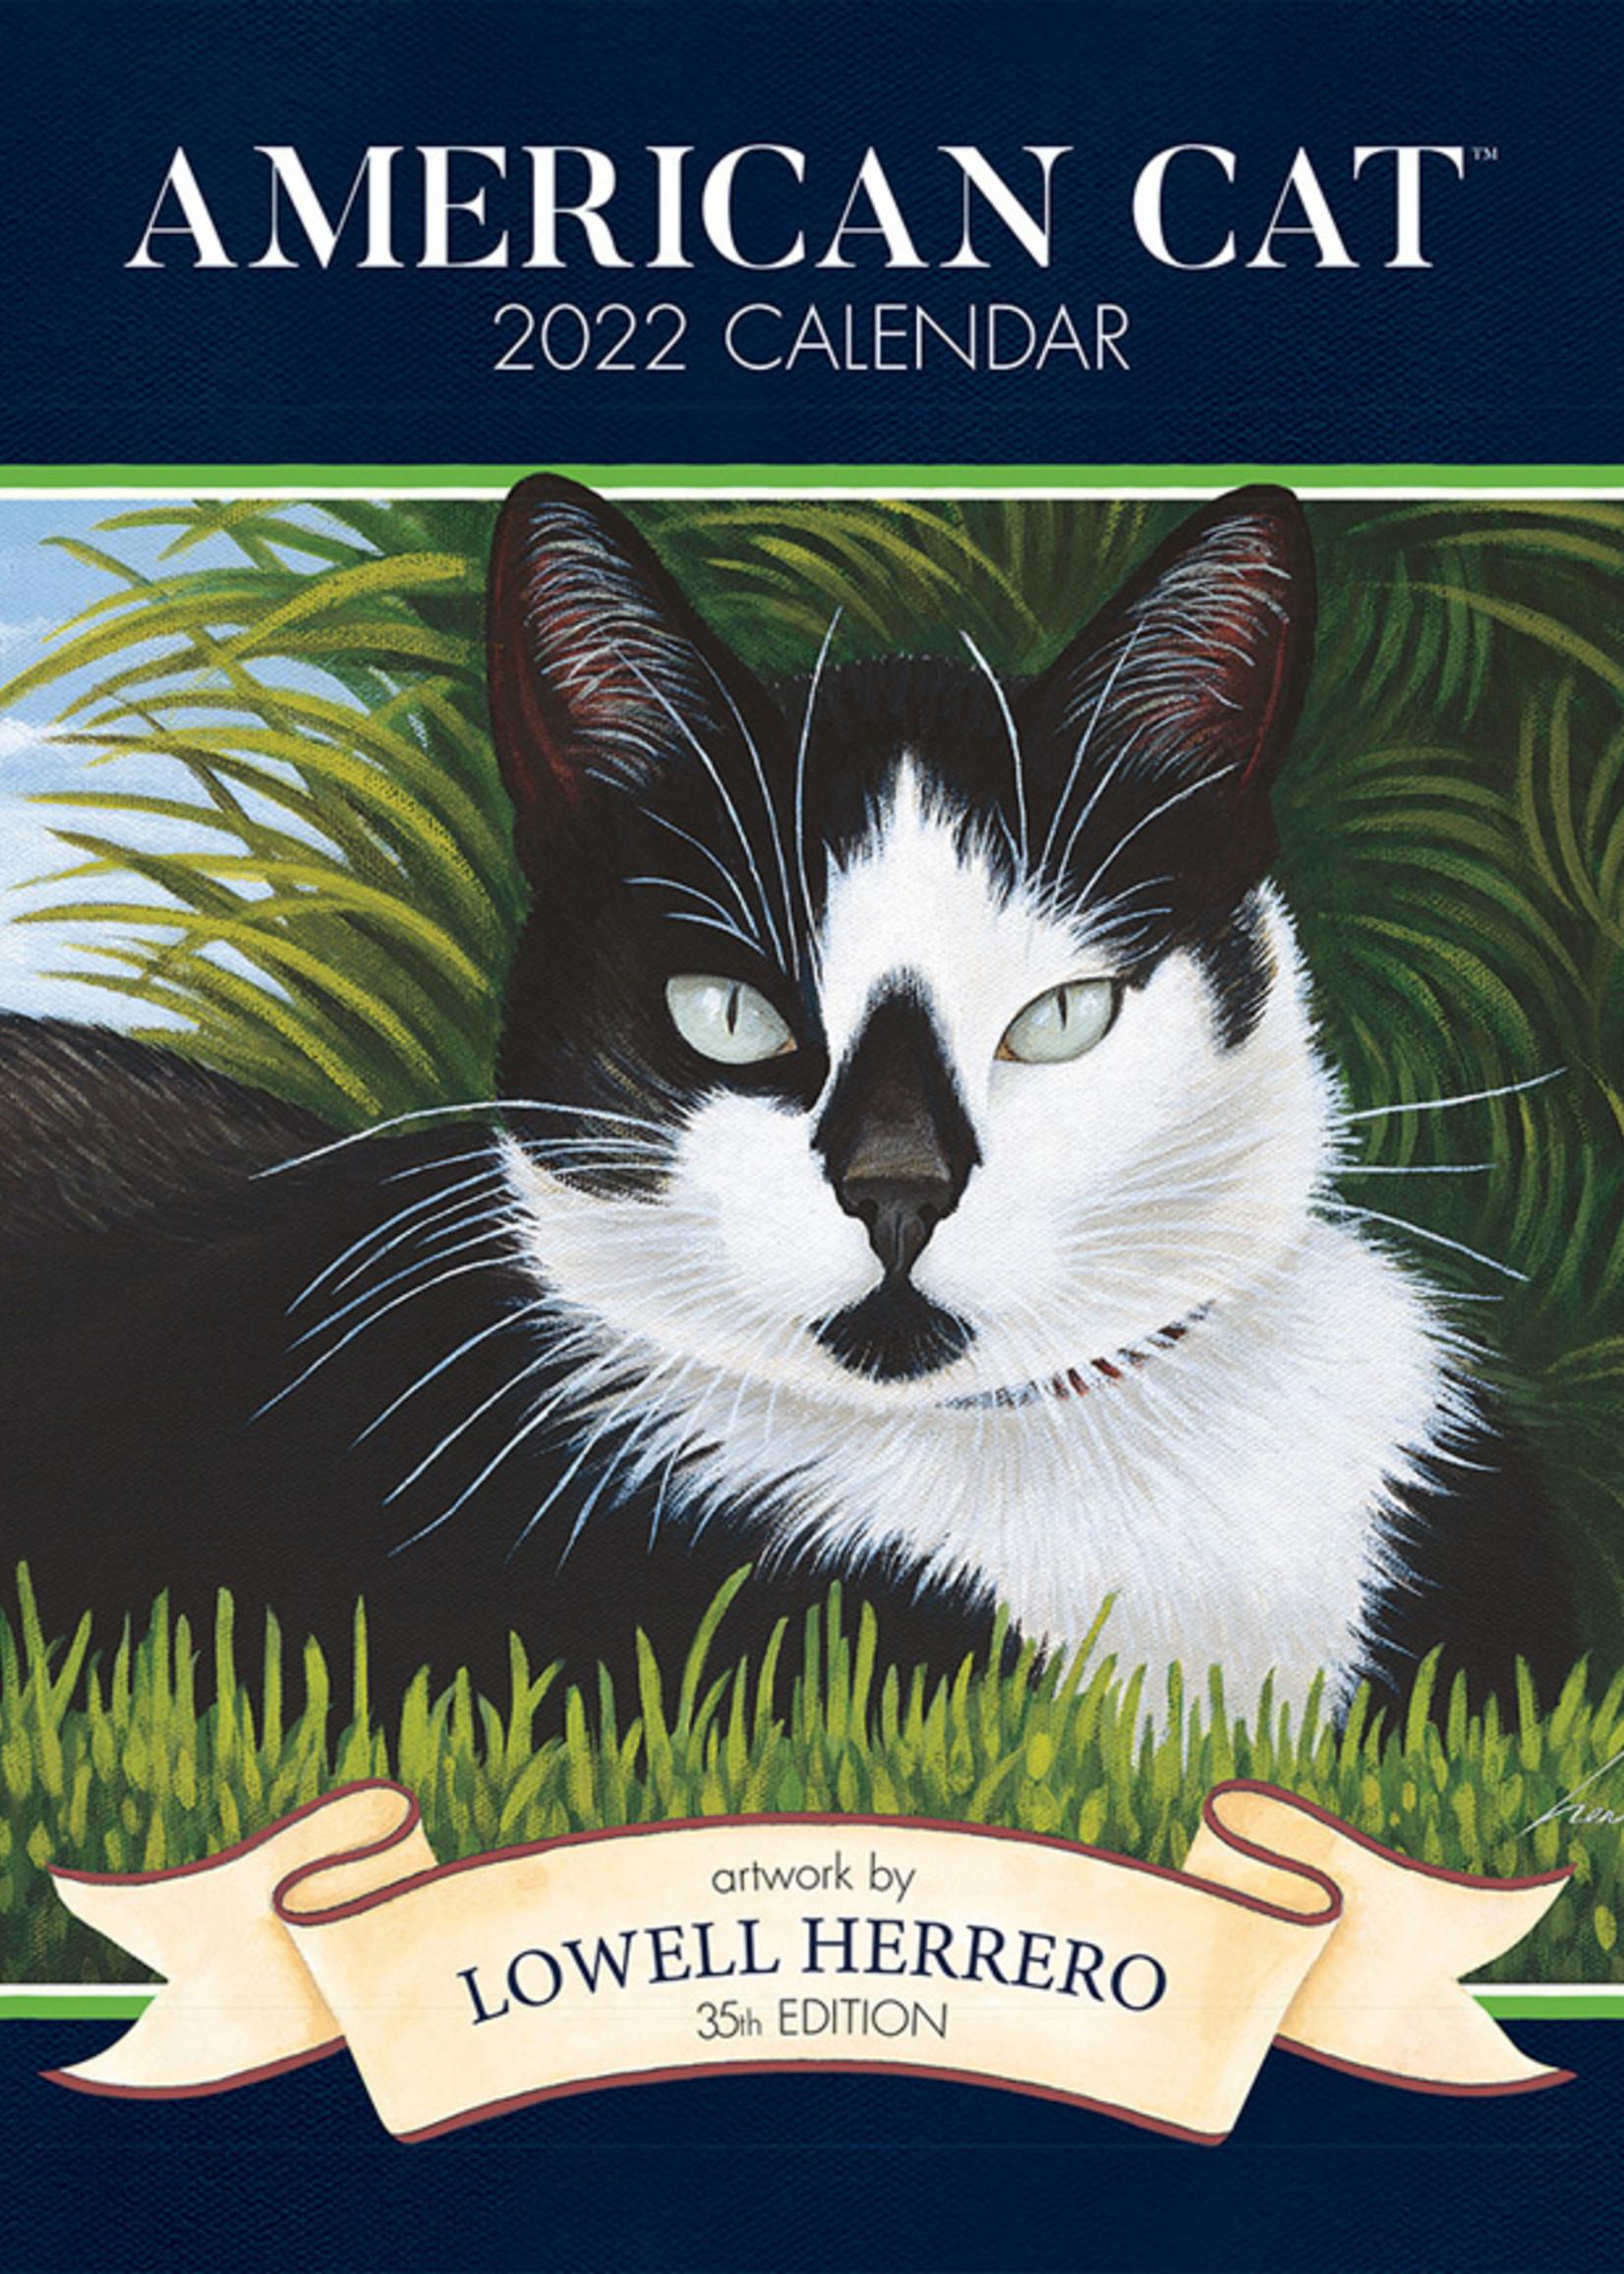 American Cat Calendar 2022